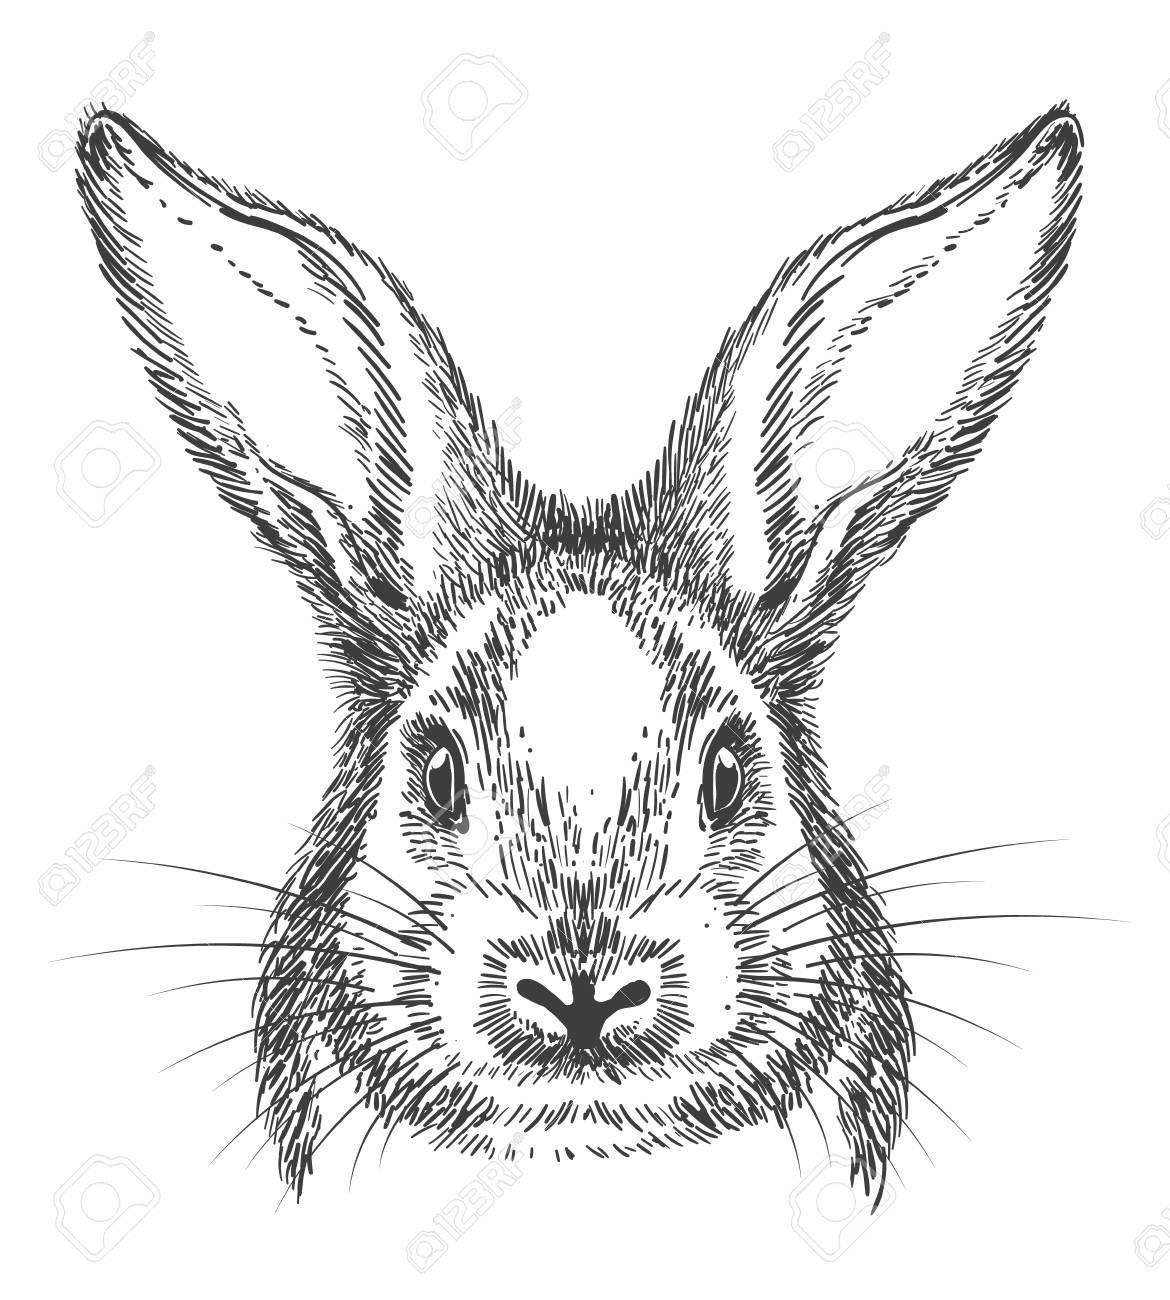 Bunny Drawing Vintage Hand Drawn Rabbit Face Vector Sketch